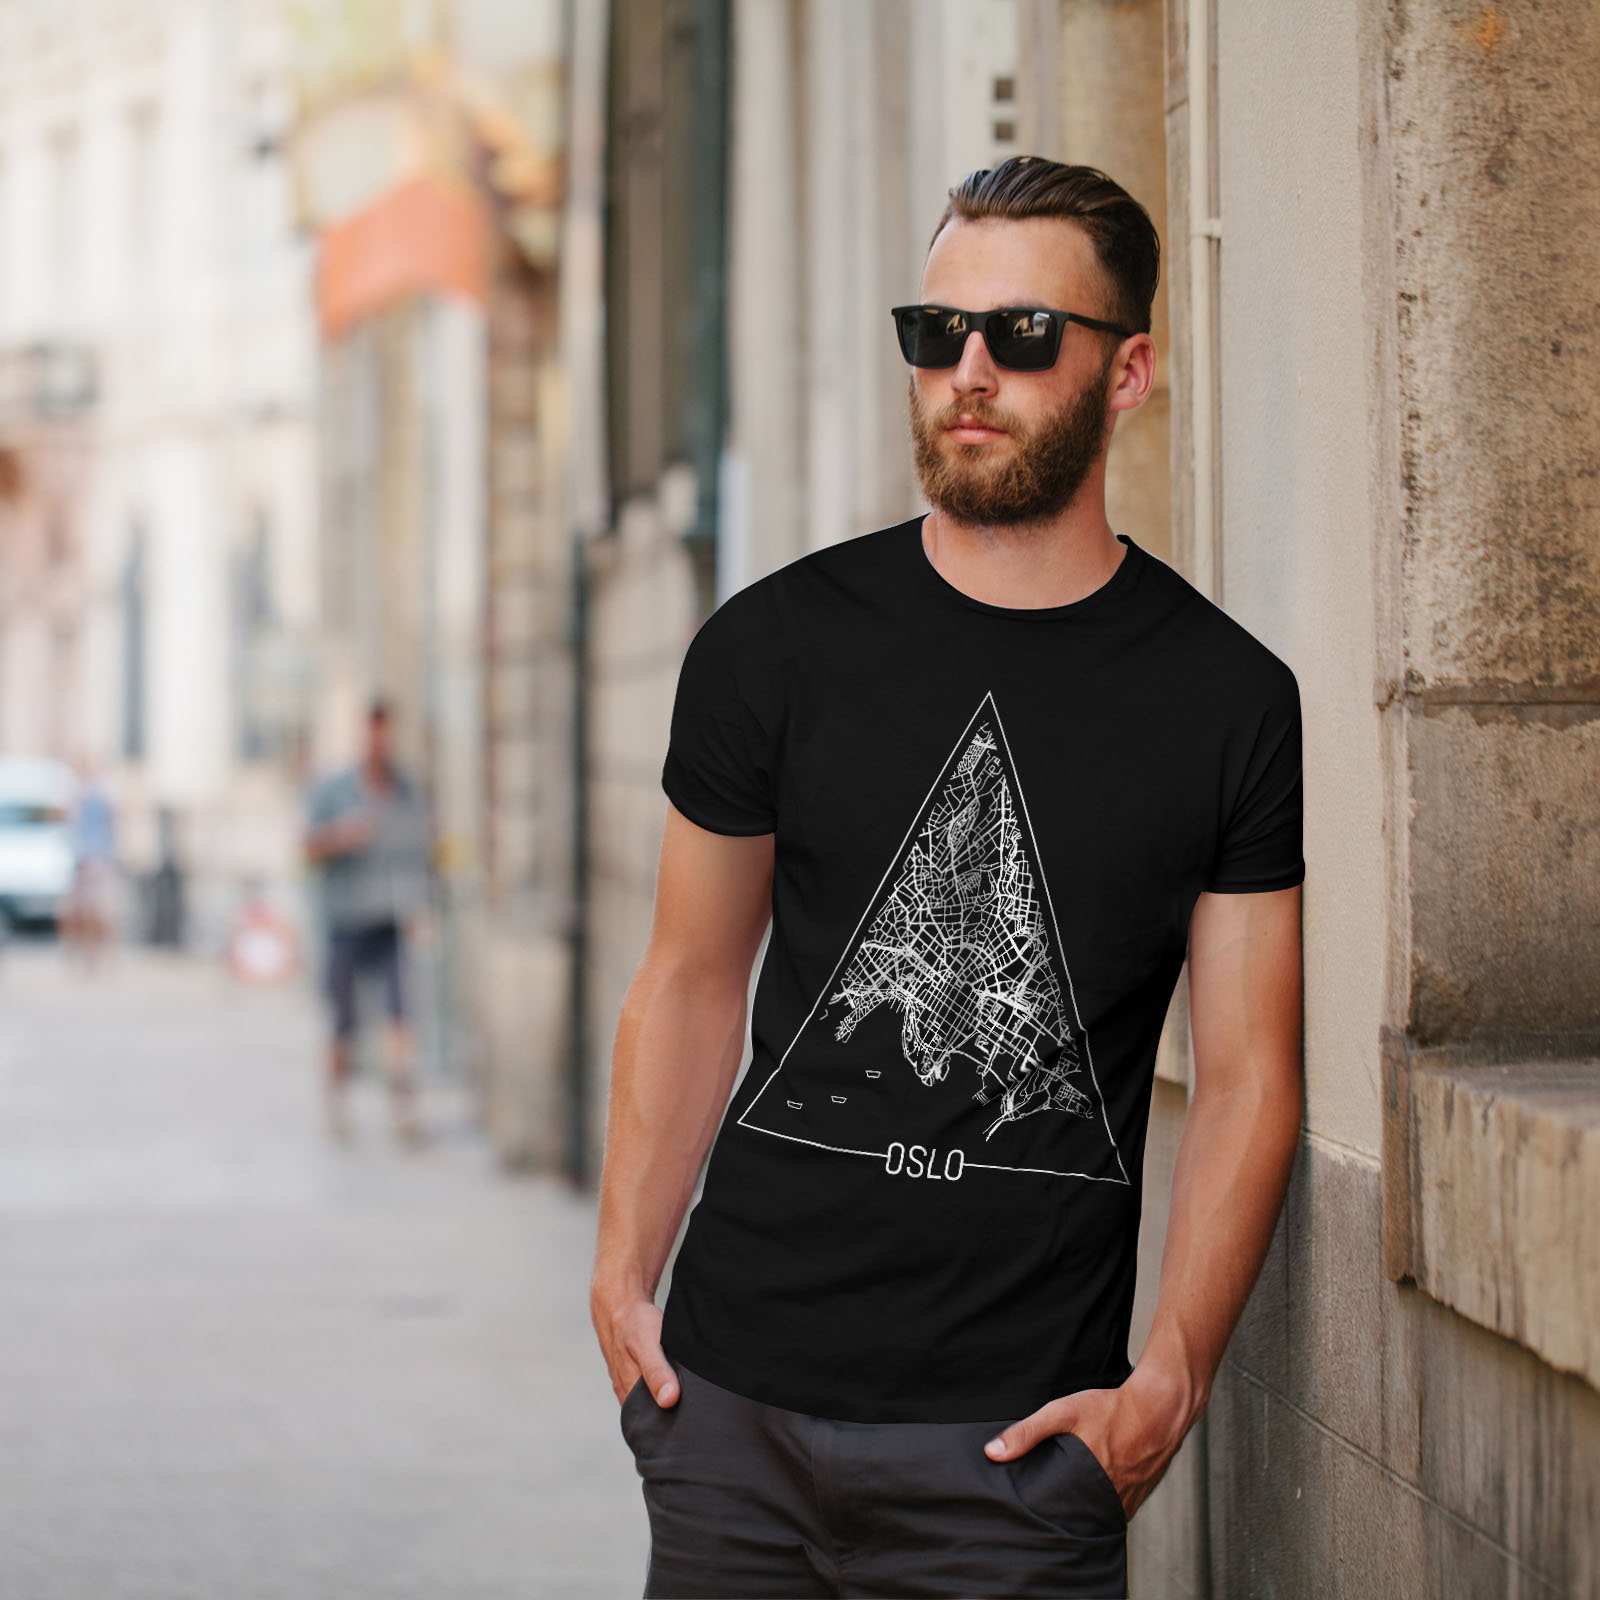 Wellcoda-Norvegia-Big-City-Oslo-da-uomo-T-shirt-Citta-design-grafico-stampato-T-shirt miniatura 5